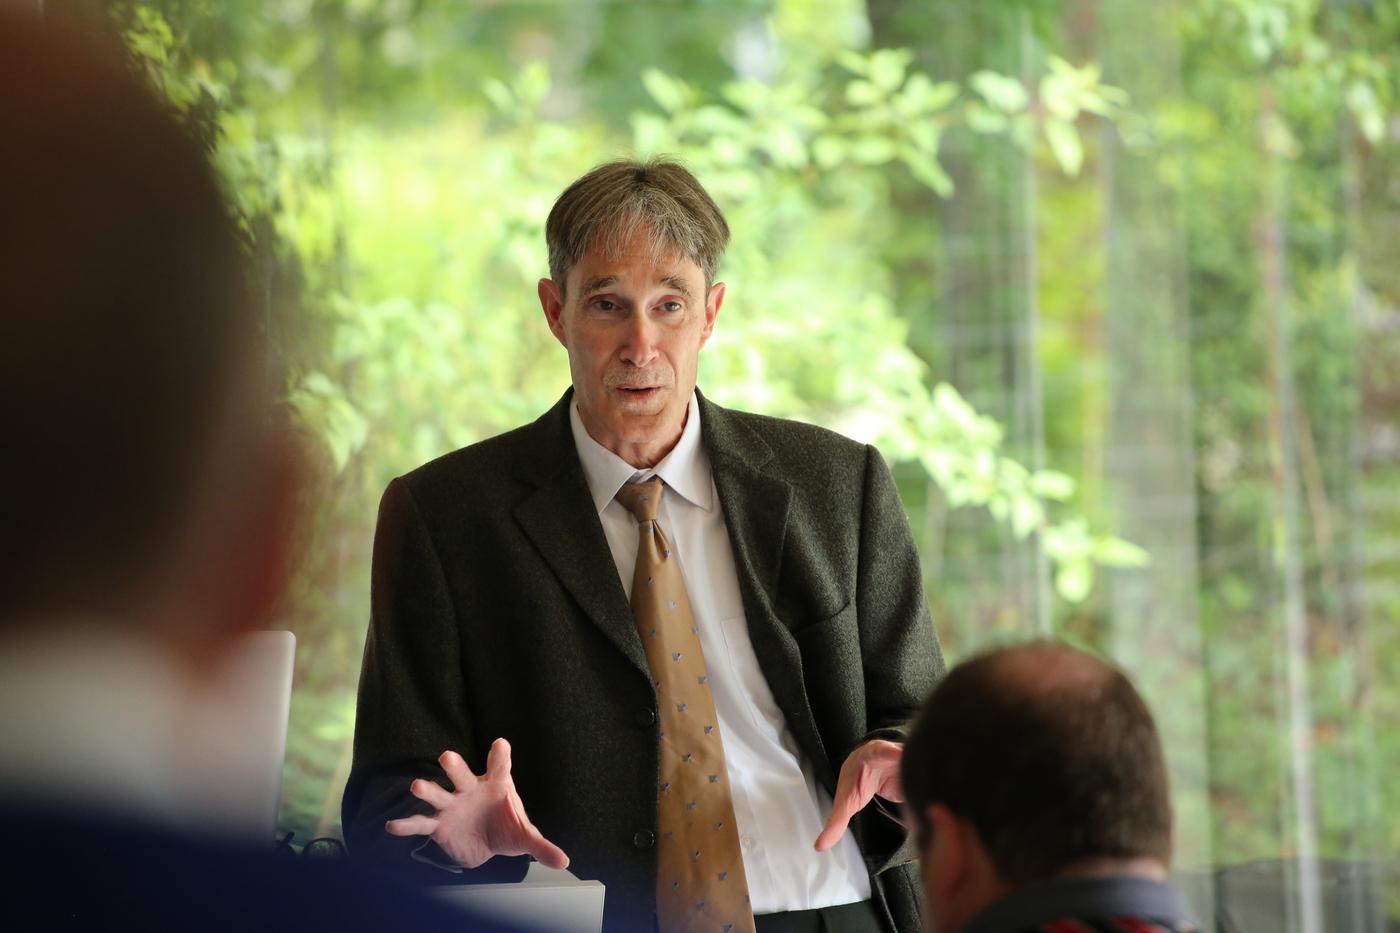 Islam Studientag Markus Zehnder Sth Basel (7)